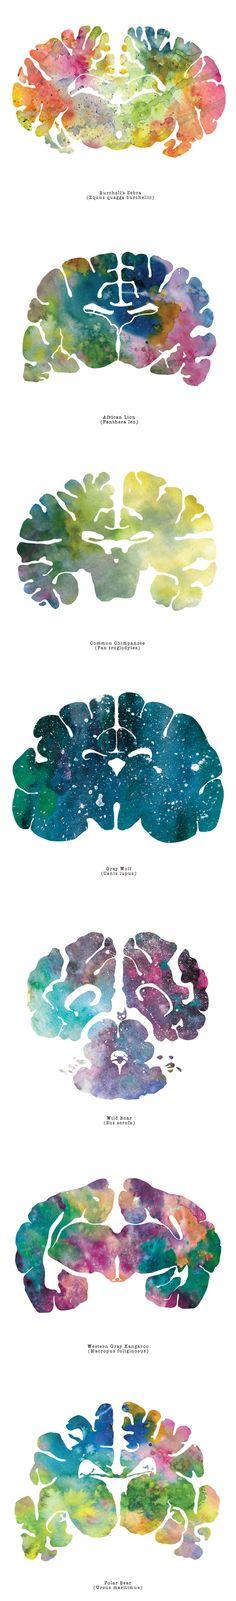 I Watercolor Animal Brain Scans Artist watercolors animal brain scans. Watercolor Animals, Watercolor Paintings, Watercolor Logo, Illustrations, Illustration Art, Brain Art, Medical Art, A Level Art, Anatomy Art